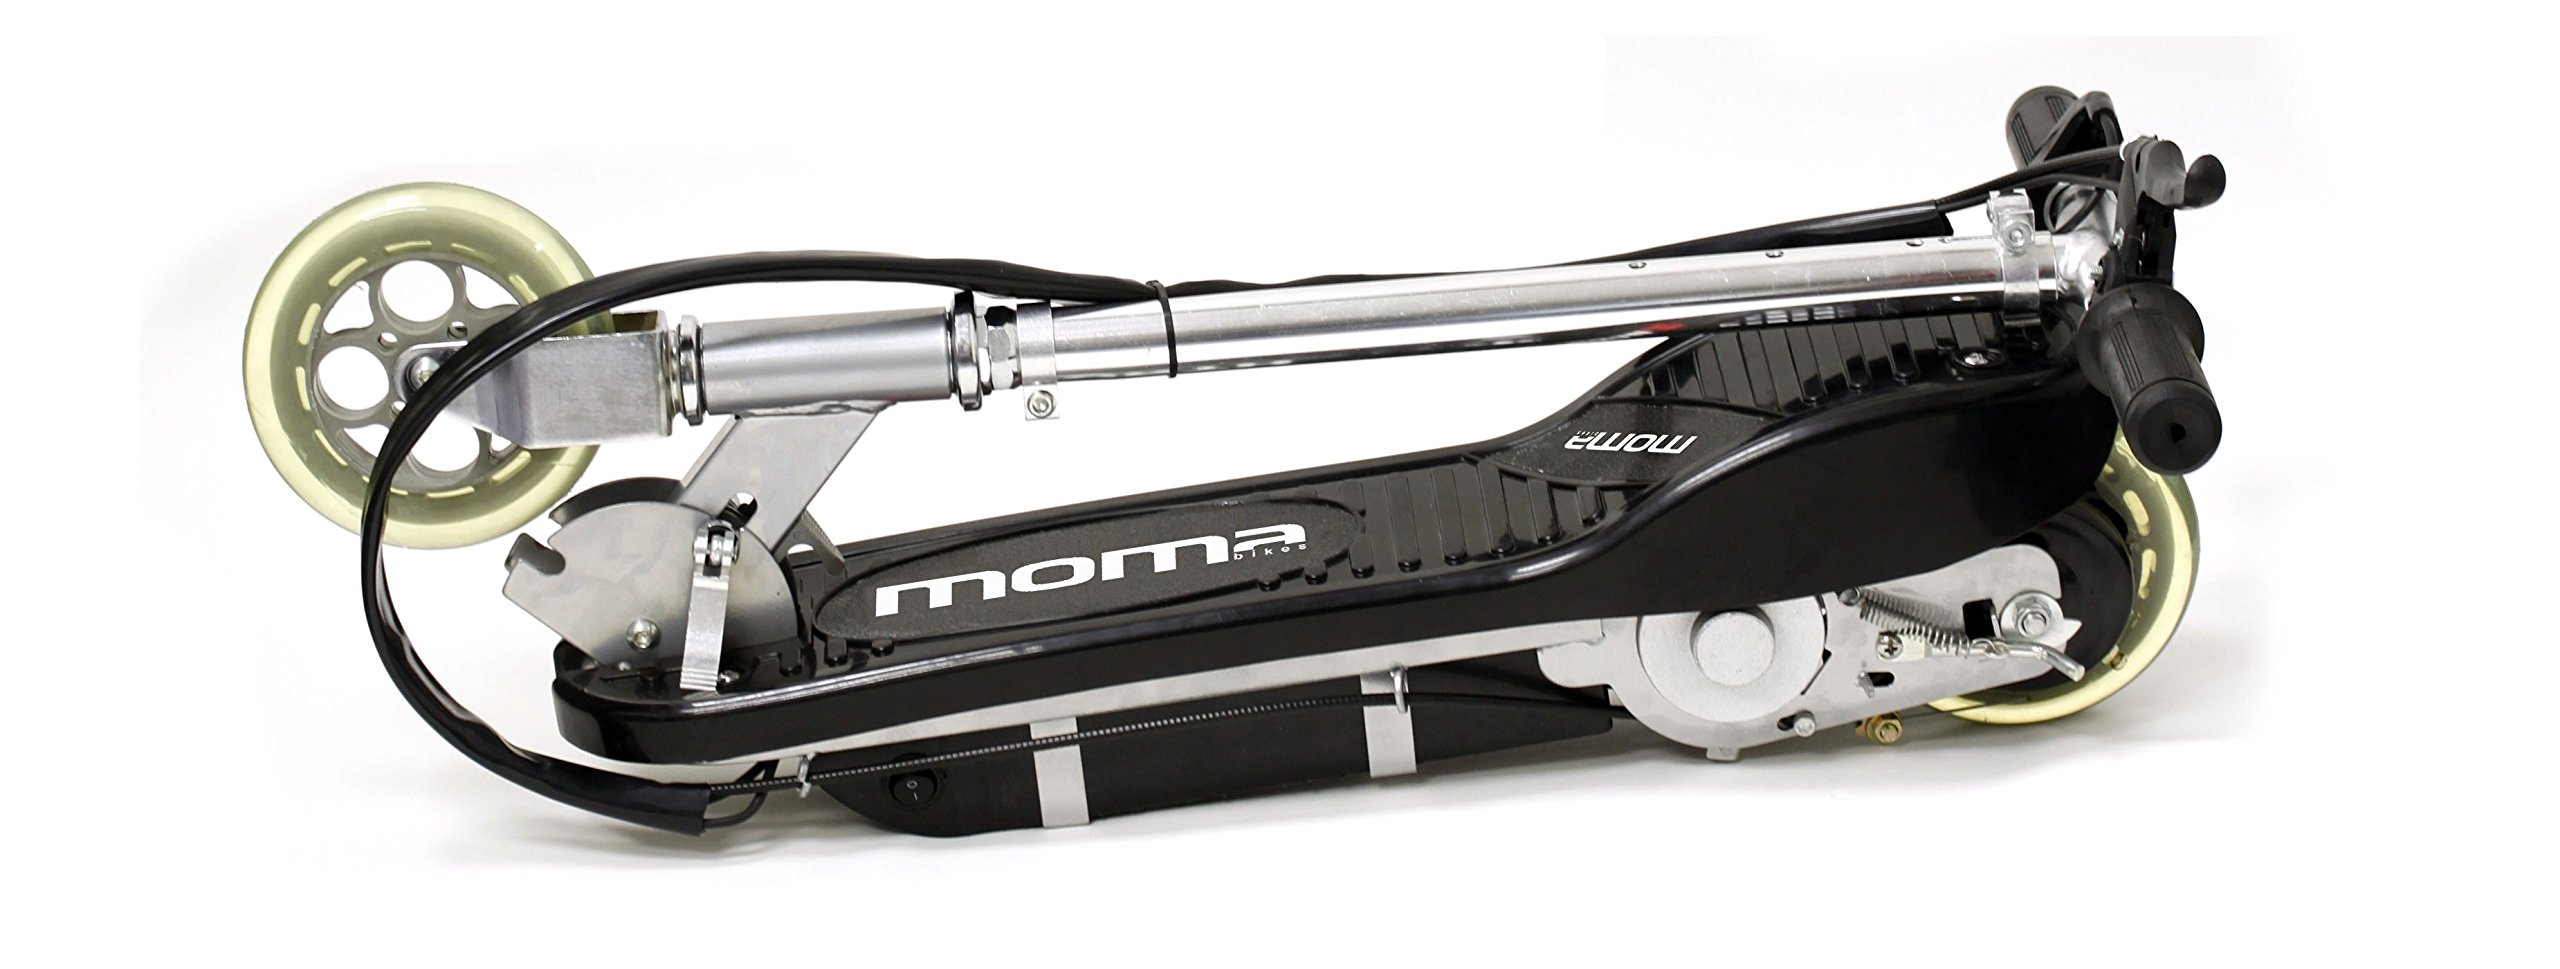 Comprar Moma Bikes Patinete Electrico Plegable Infantil Scooter 120W, Ruedas 6